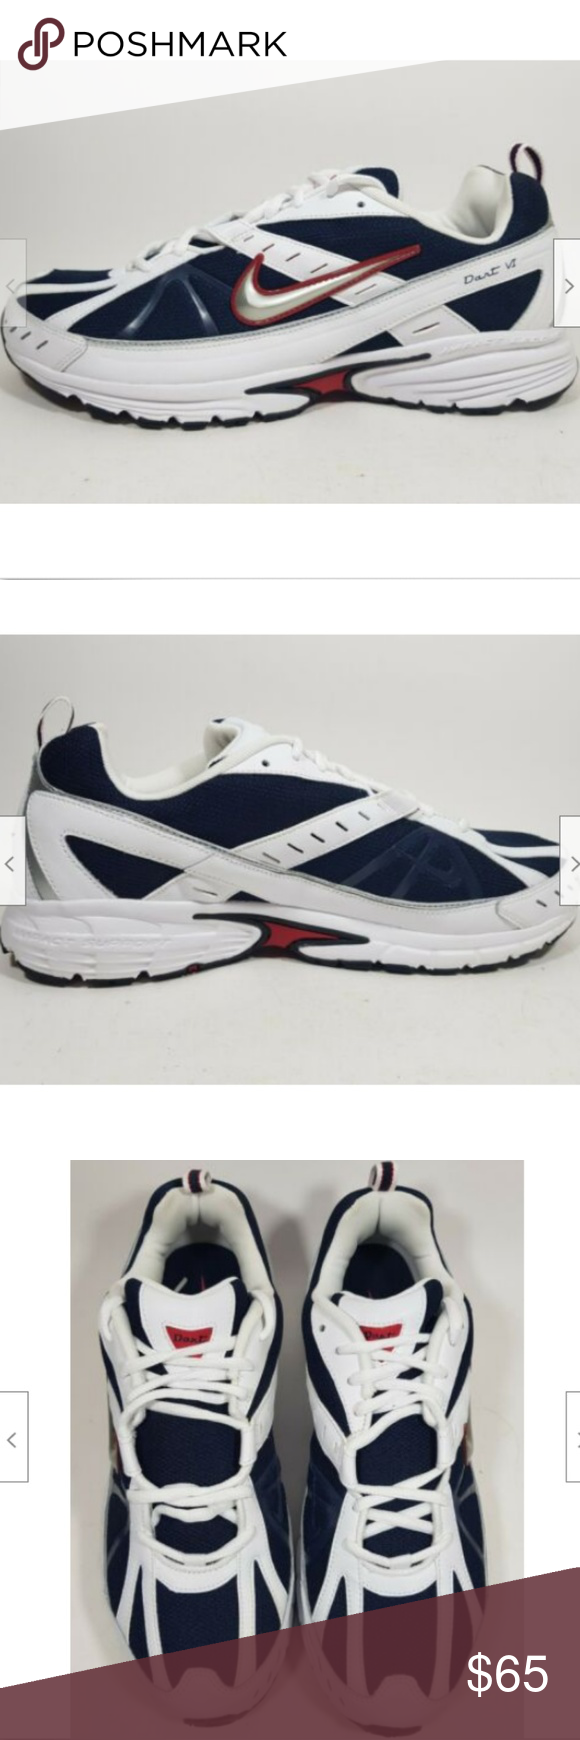 Nike Dart VI Running Sneakers Athletic